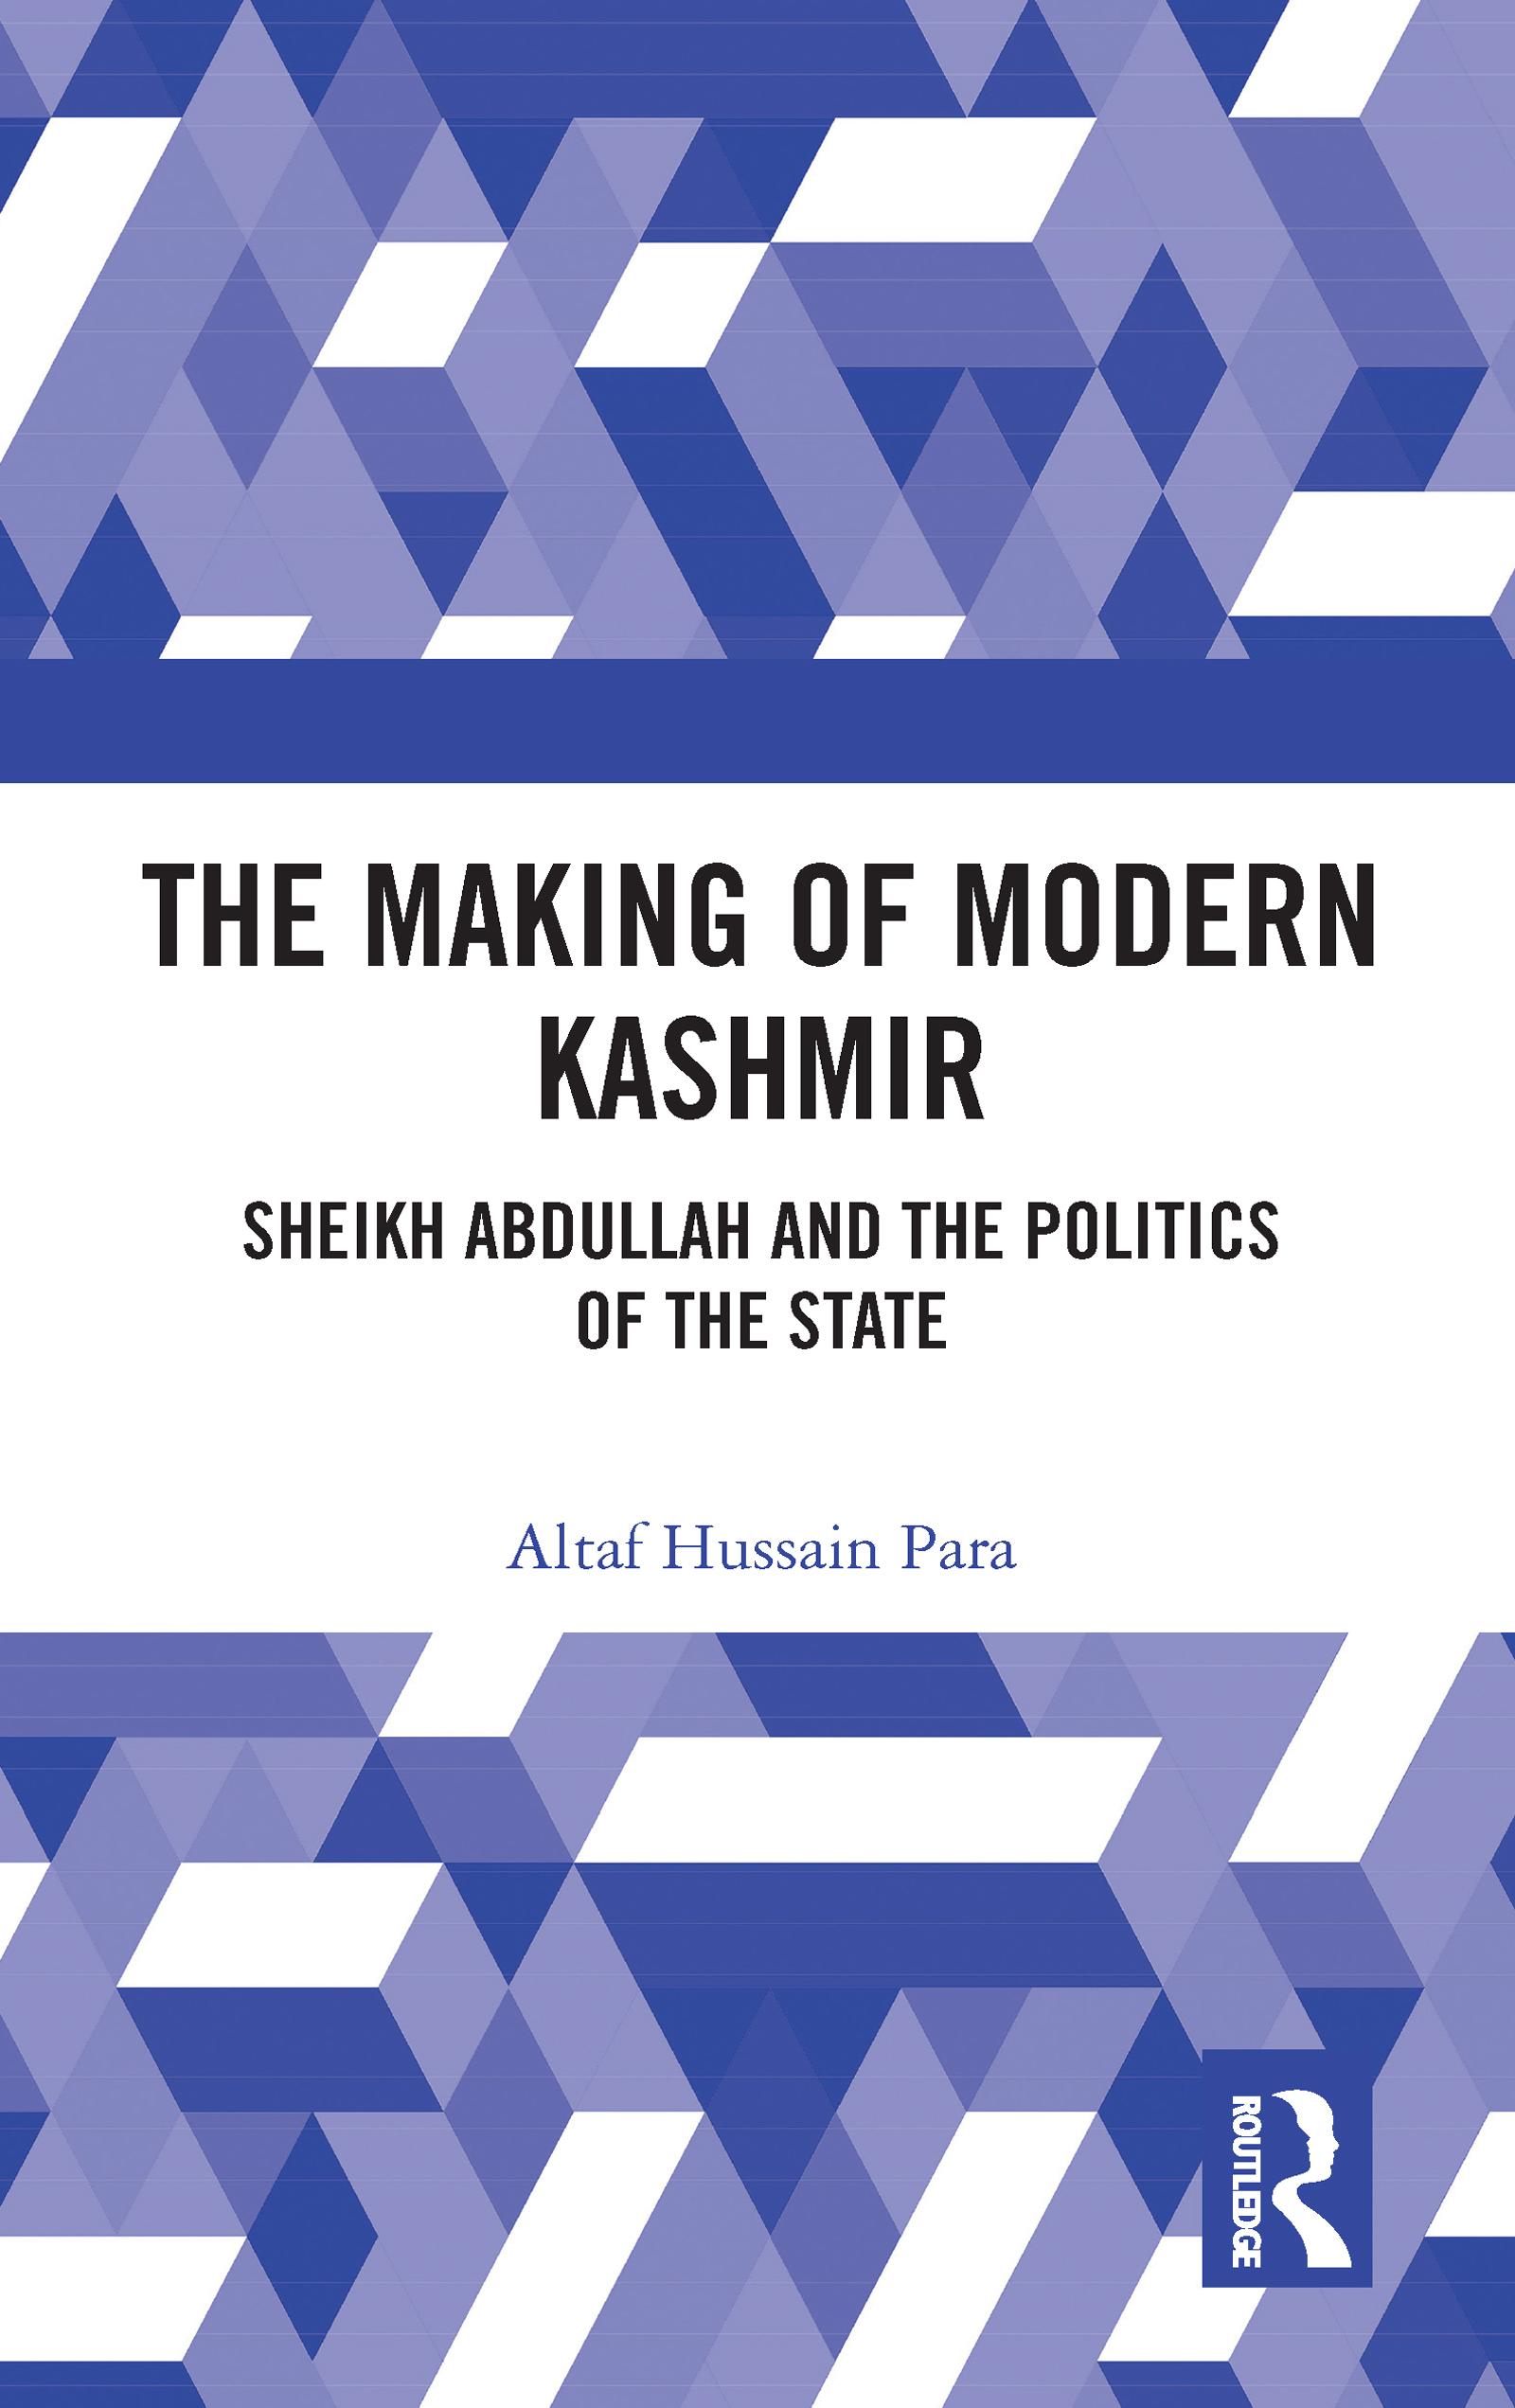 The Making of Modern Kashmir